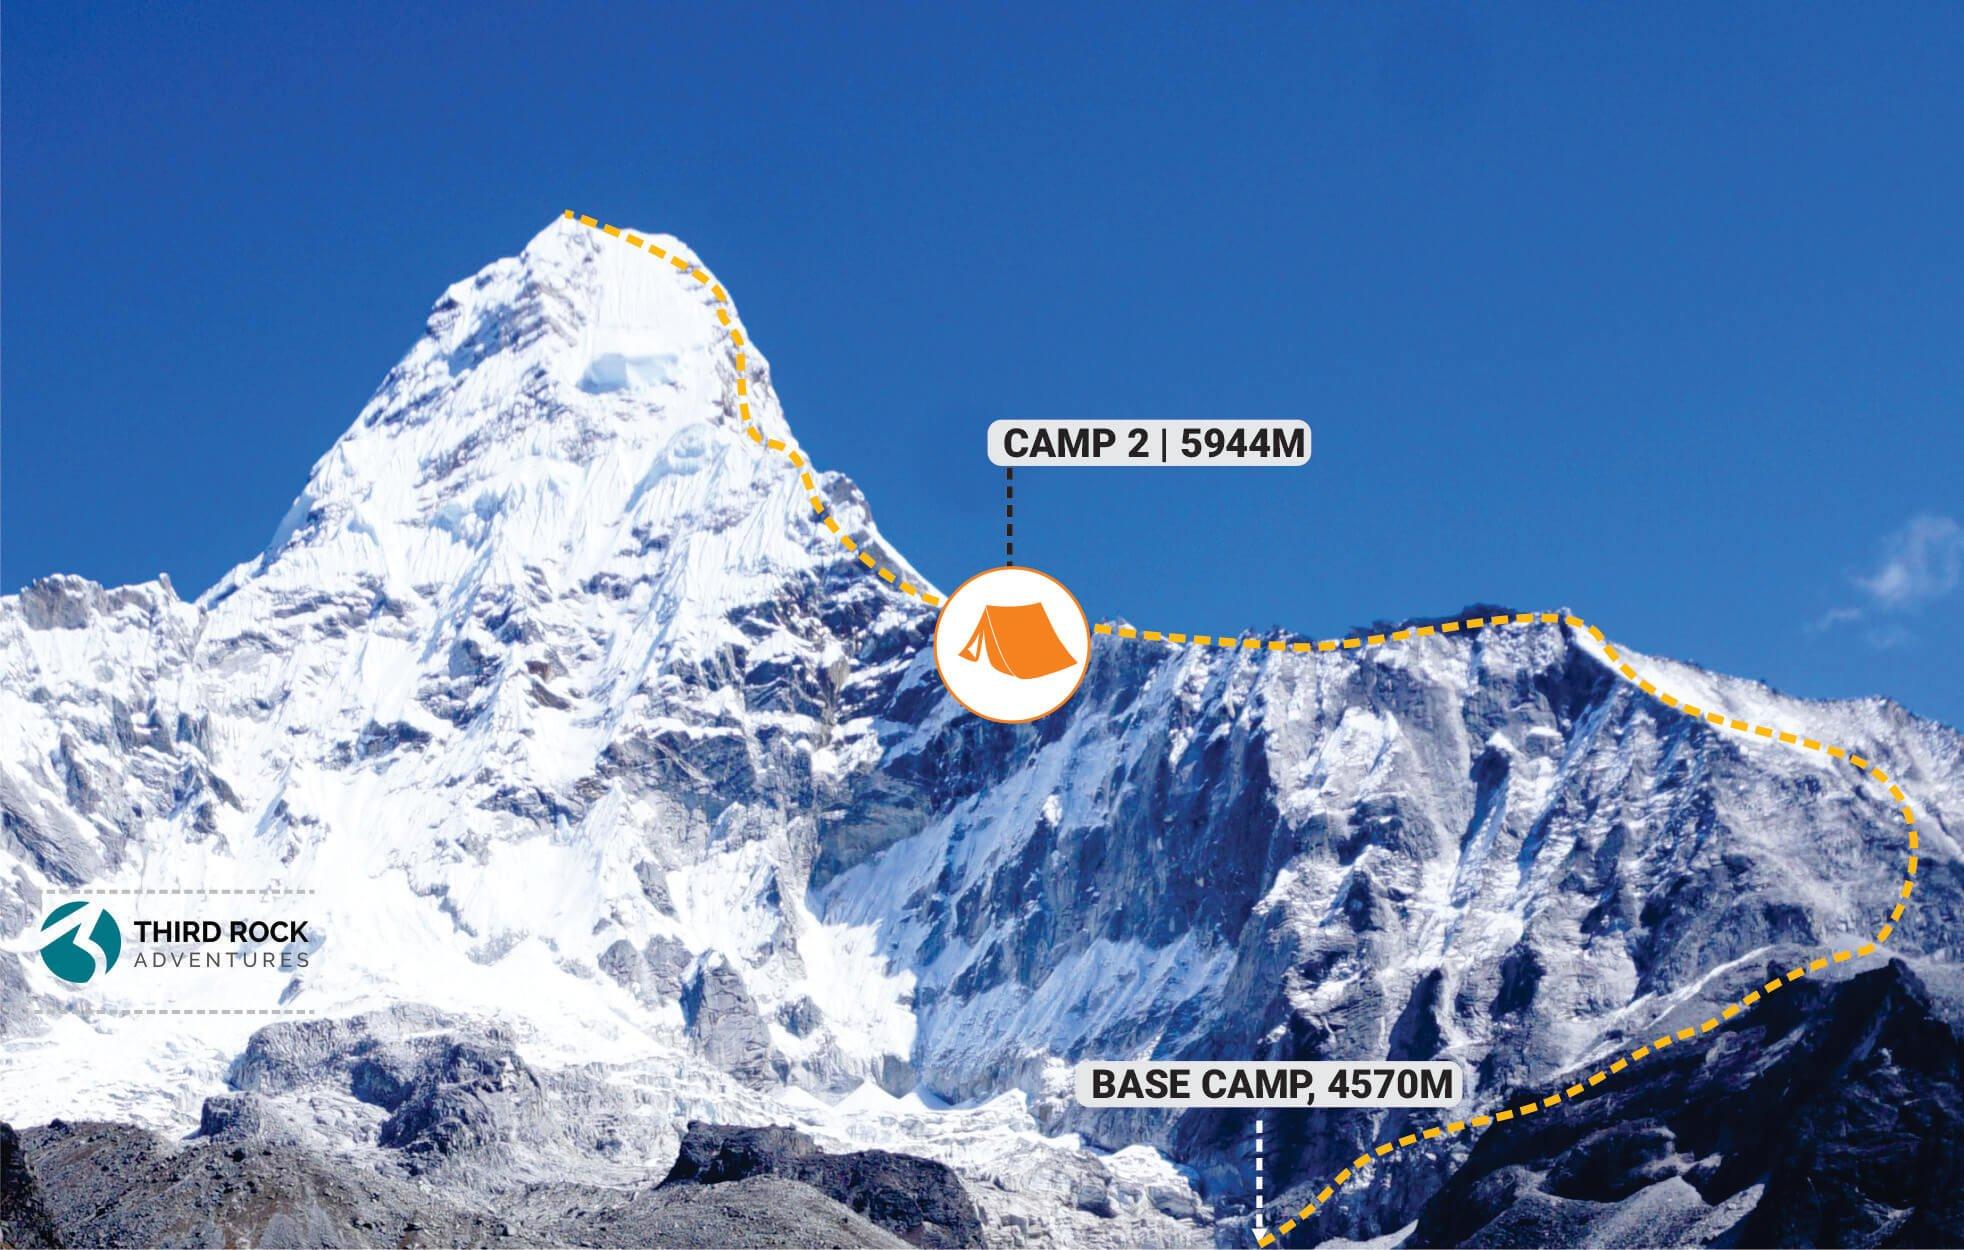 Ama Dablam Climb - Camp 2